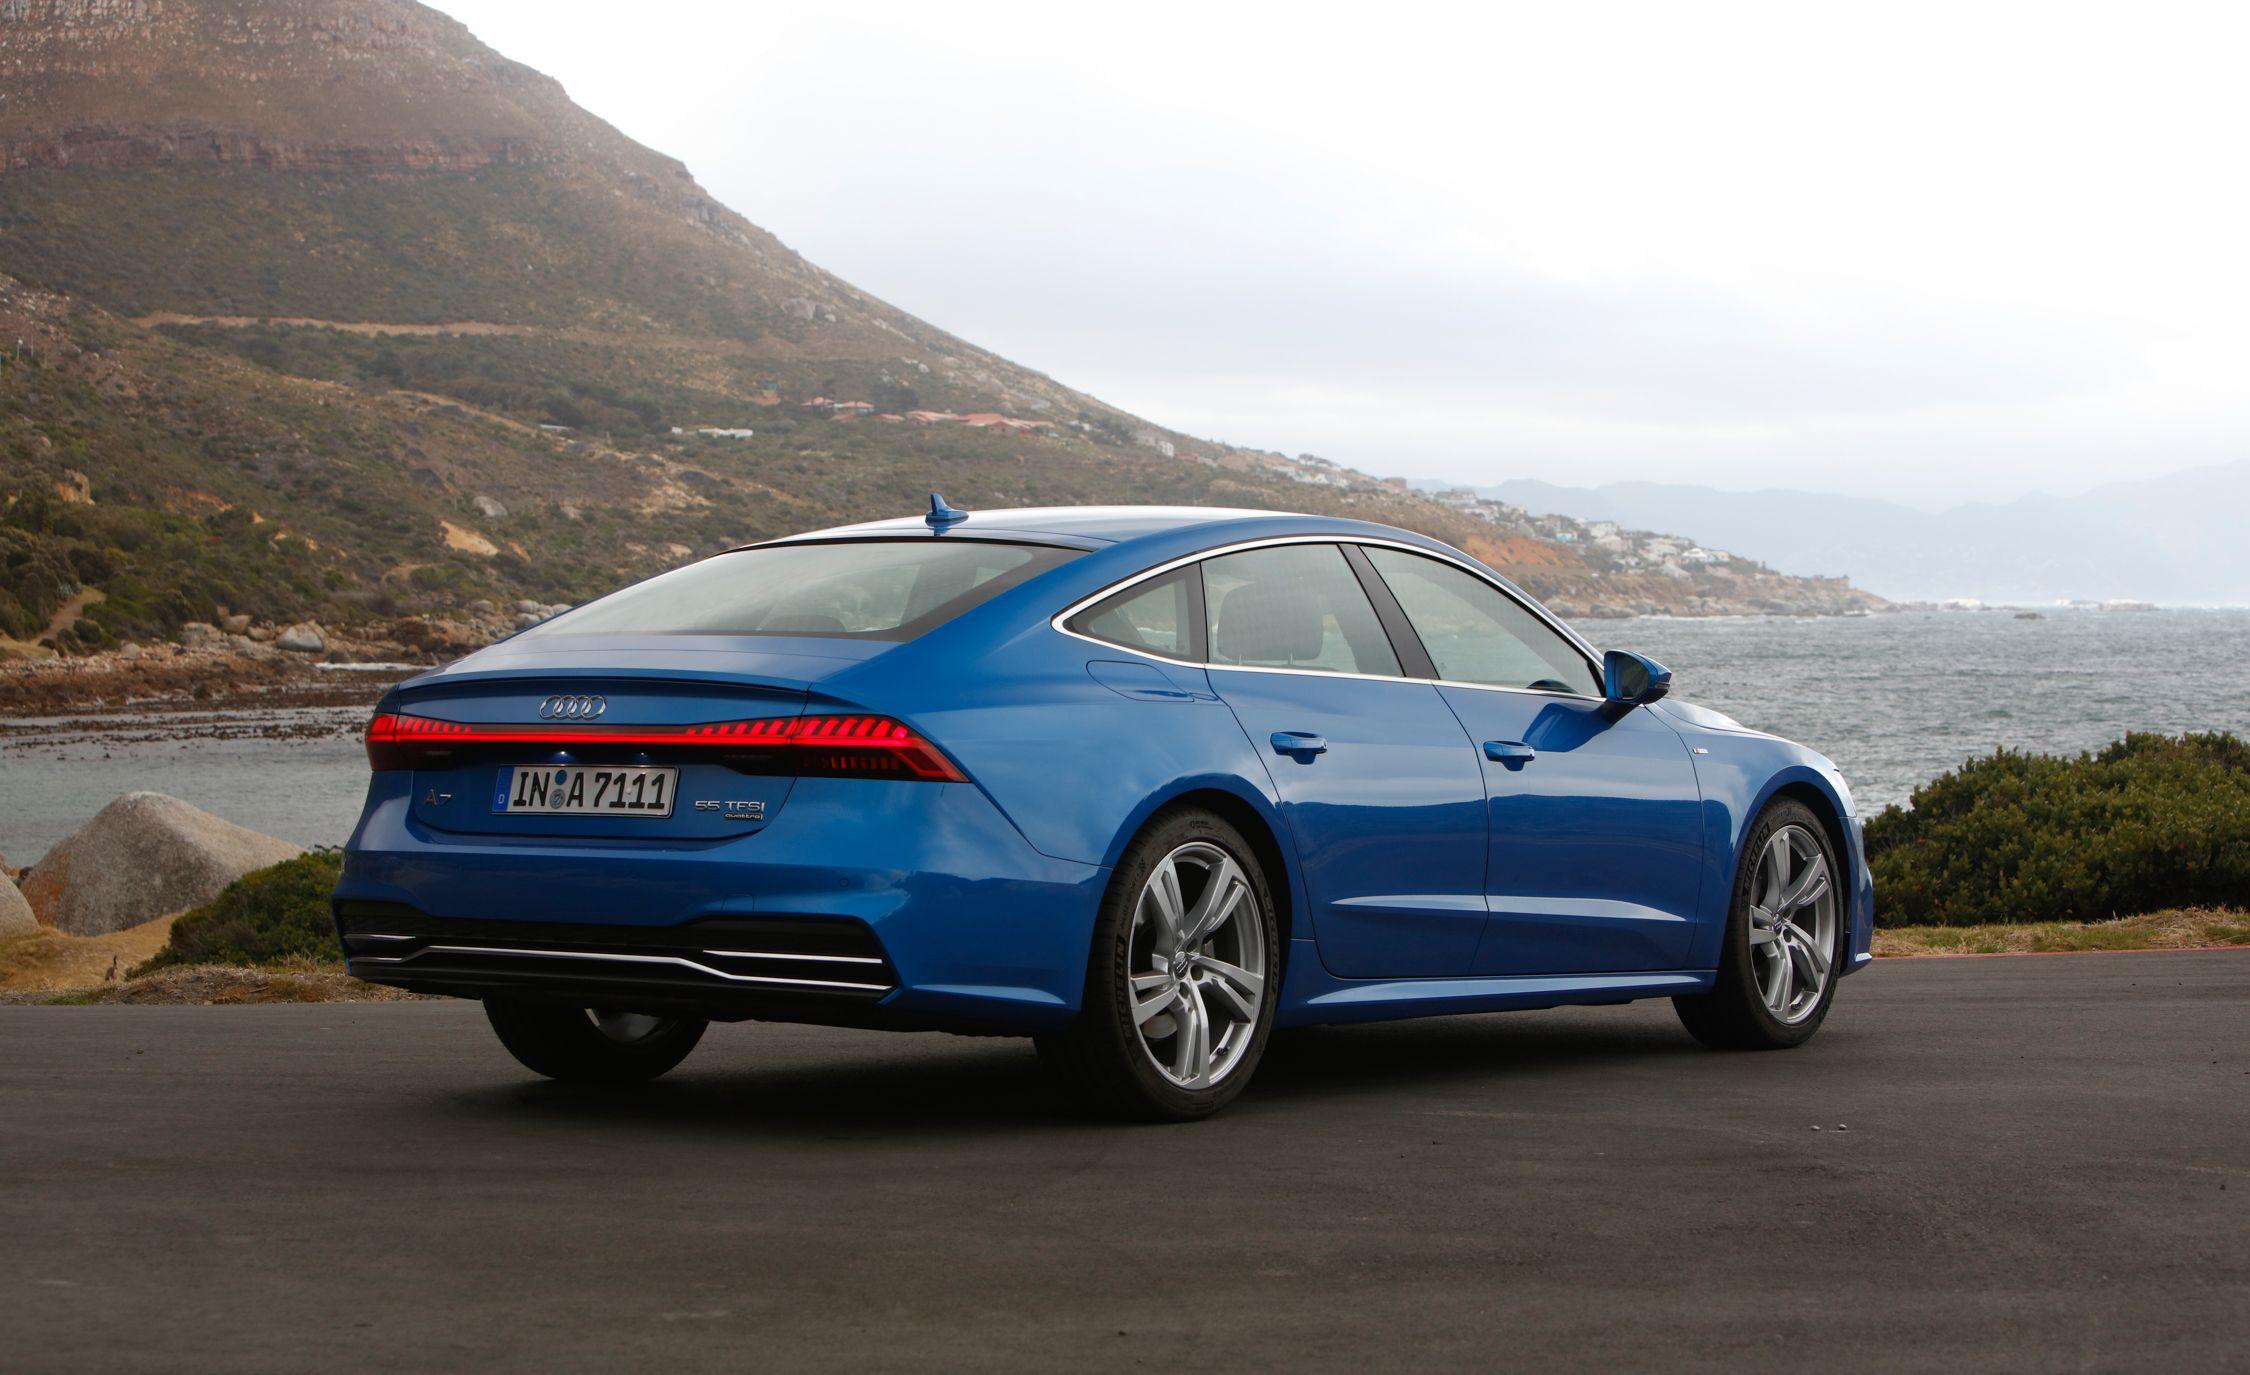 2019-Audi-A7-Sportback-125-1.jpg